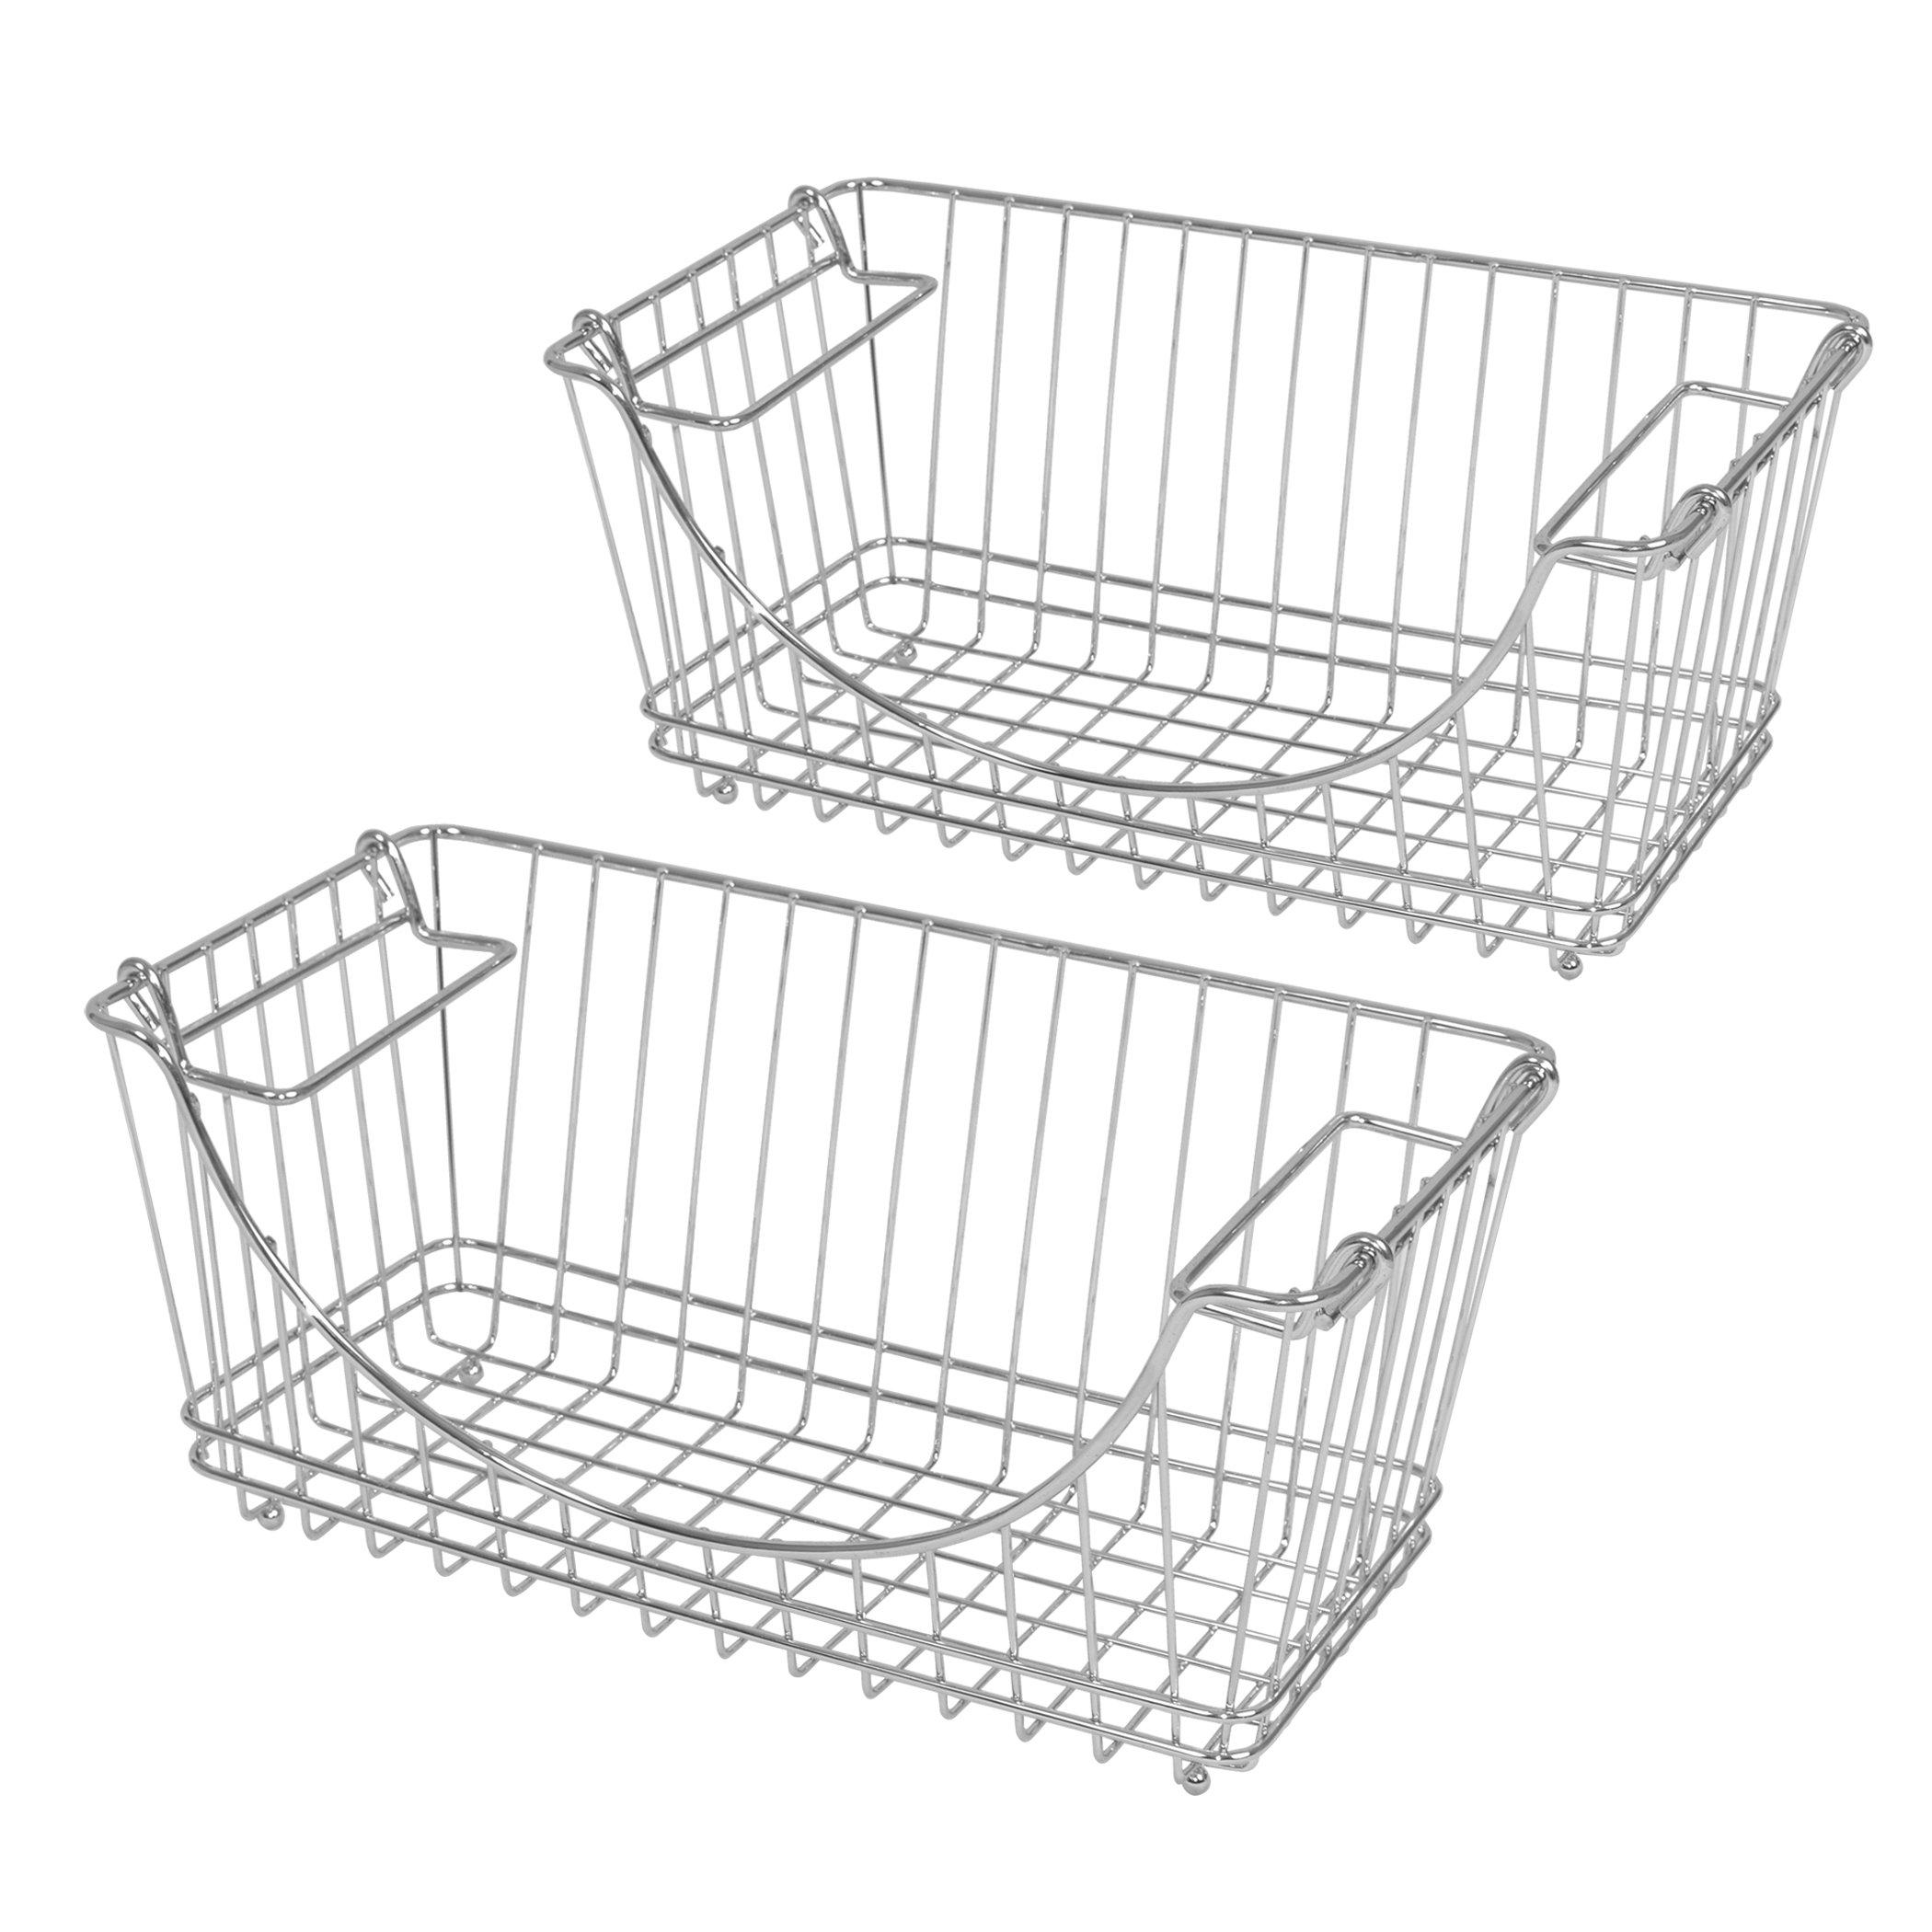 Pro-Mart DAZZ Medium Stacking Baskets Chrome Set of 2 | eBay